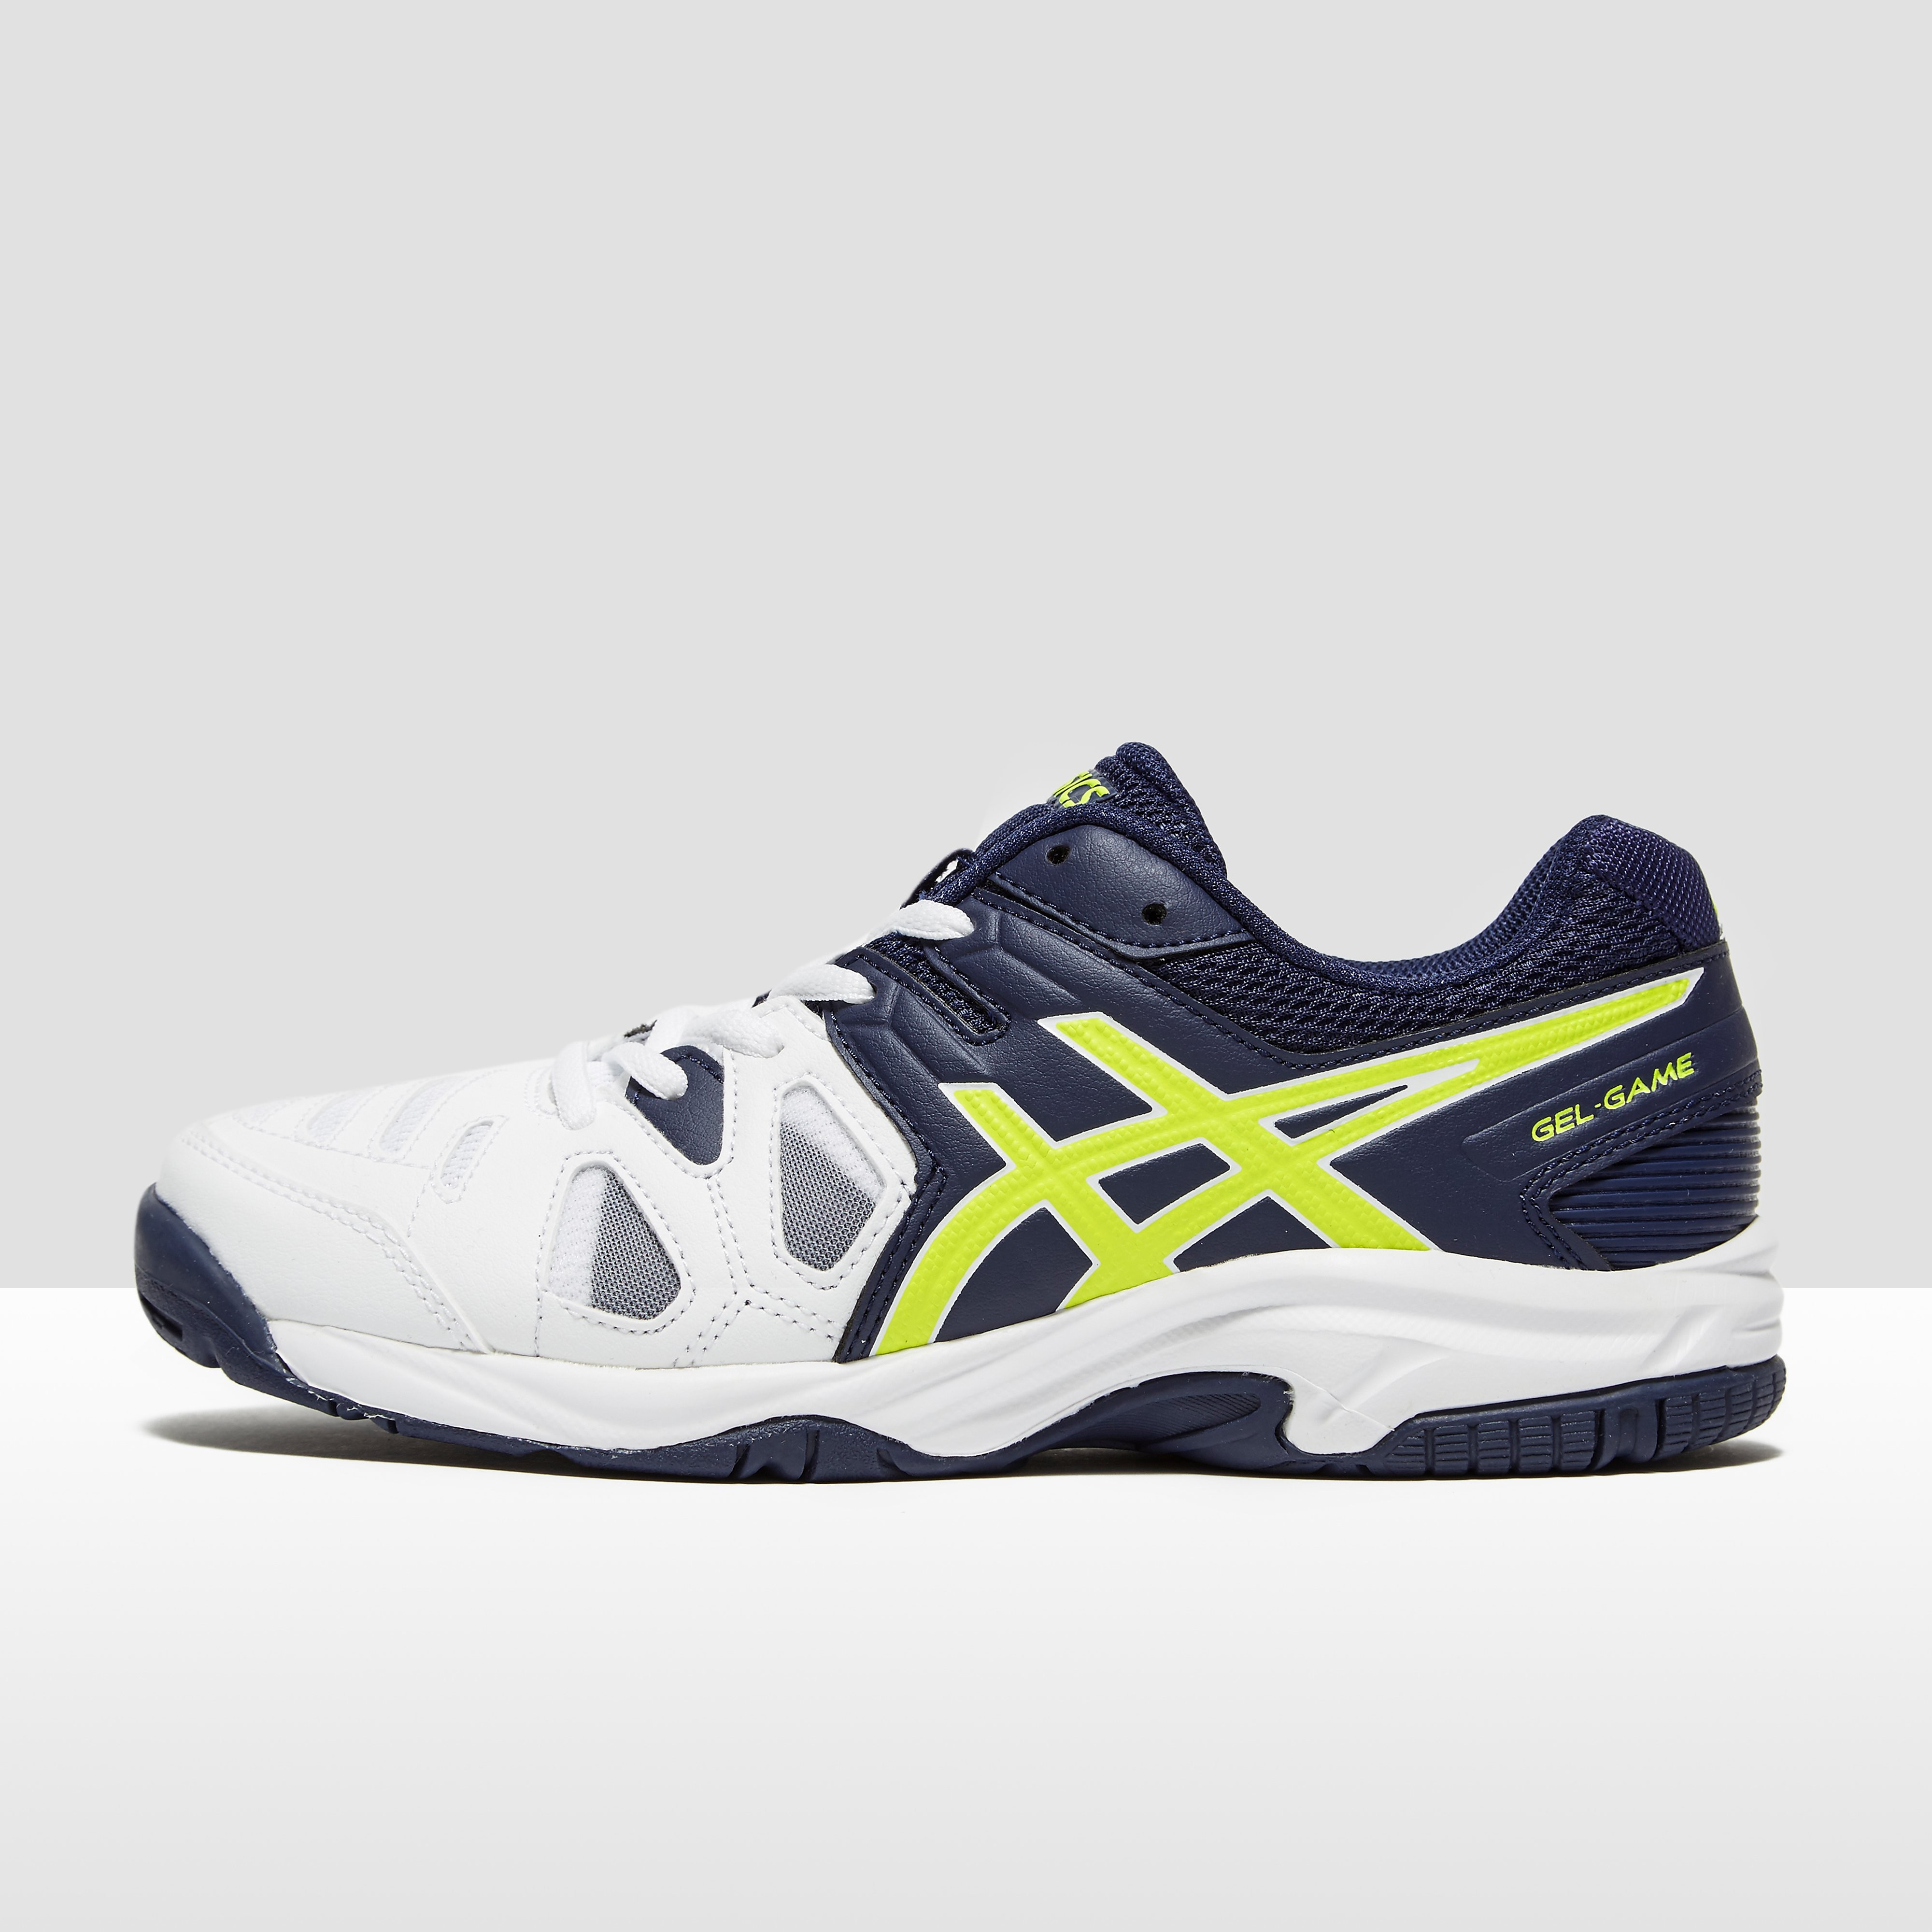 ASICS GEL Game 5 GS Junior Tennis Shoes